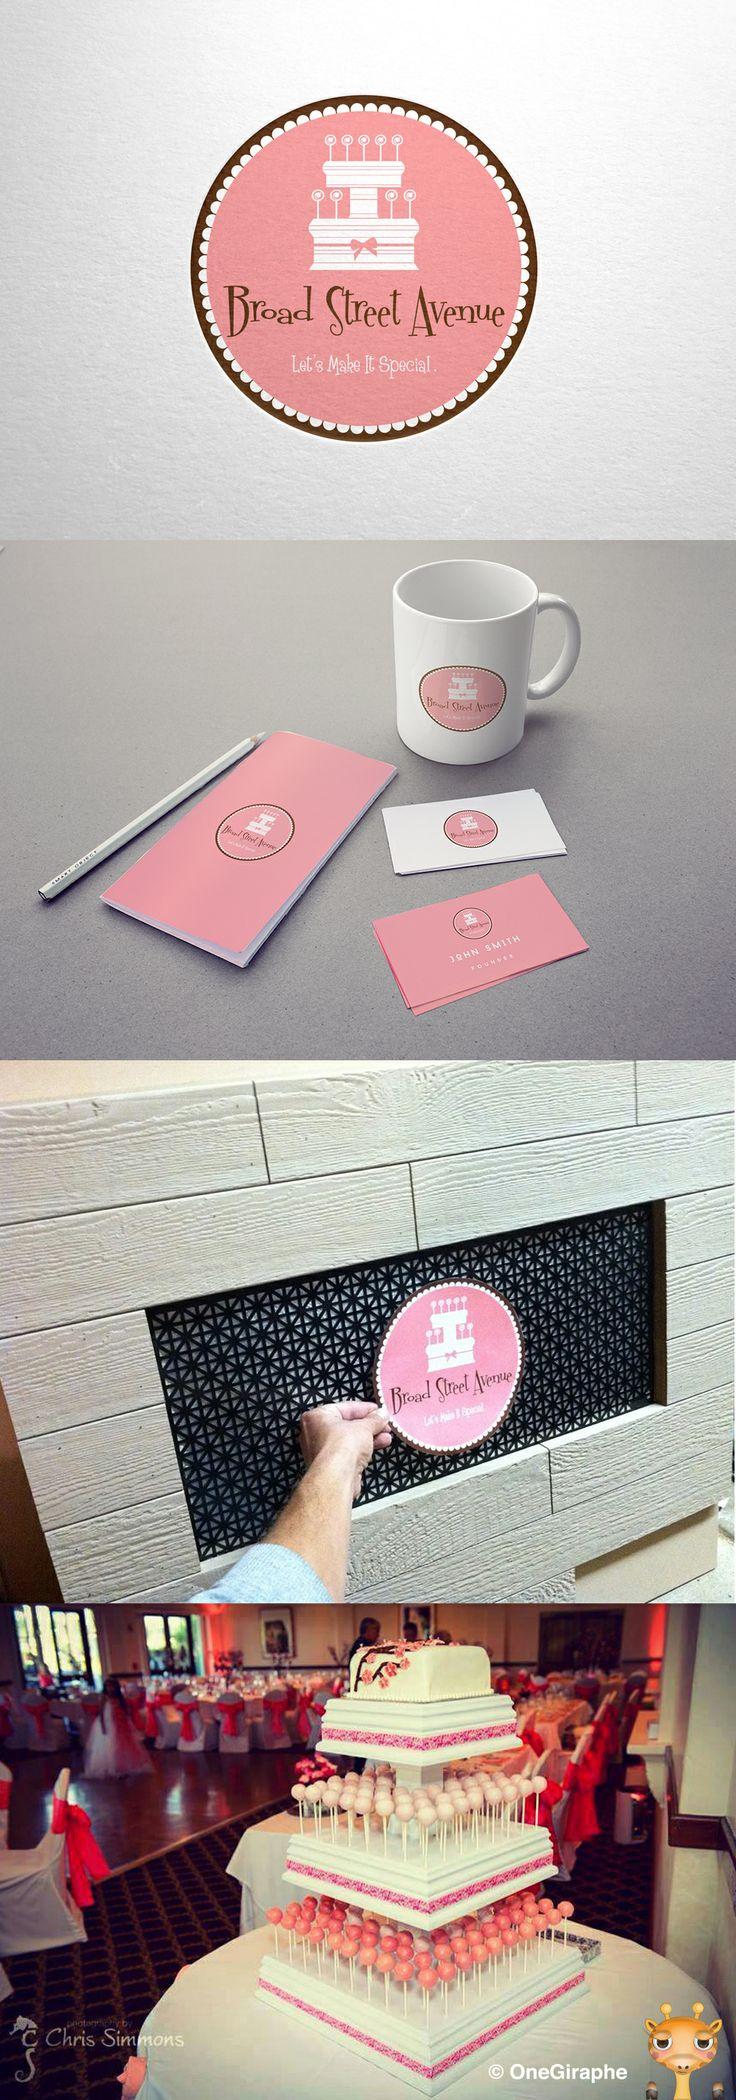 Broad Street Avenue #logo #logodesign #design #graphicdesign #portfolio #designer #cake #cupcake #macaroon #cakepops #stand #wood #store #sweet #pink